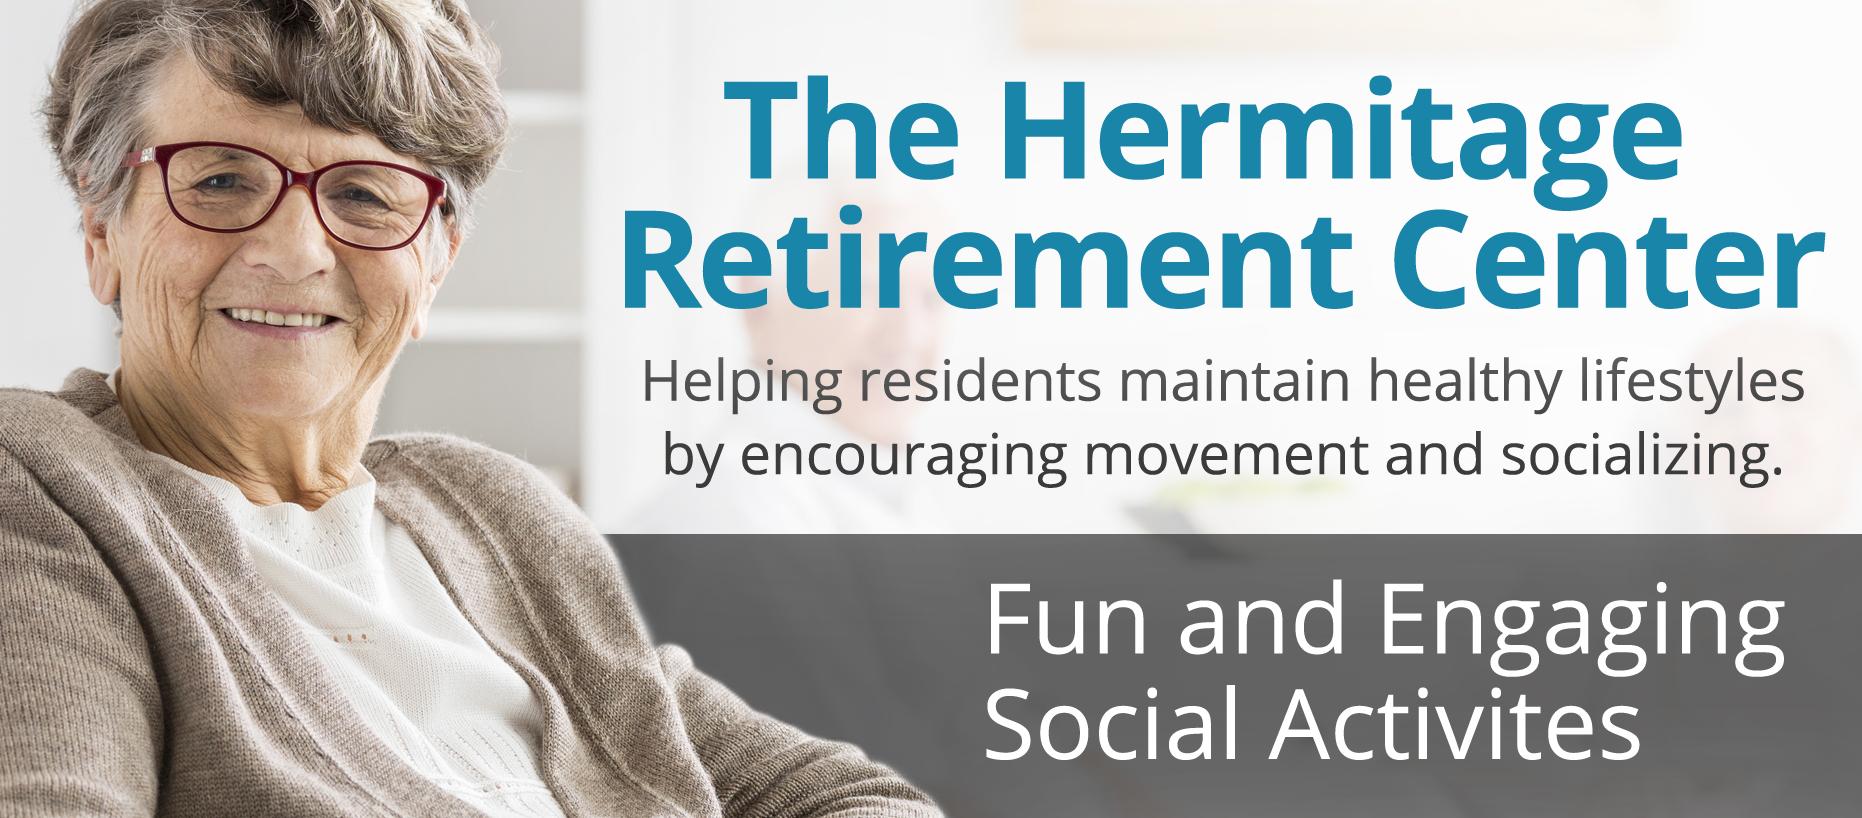 Hermitage Retirement Center